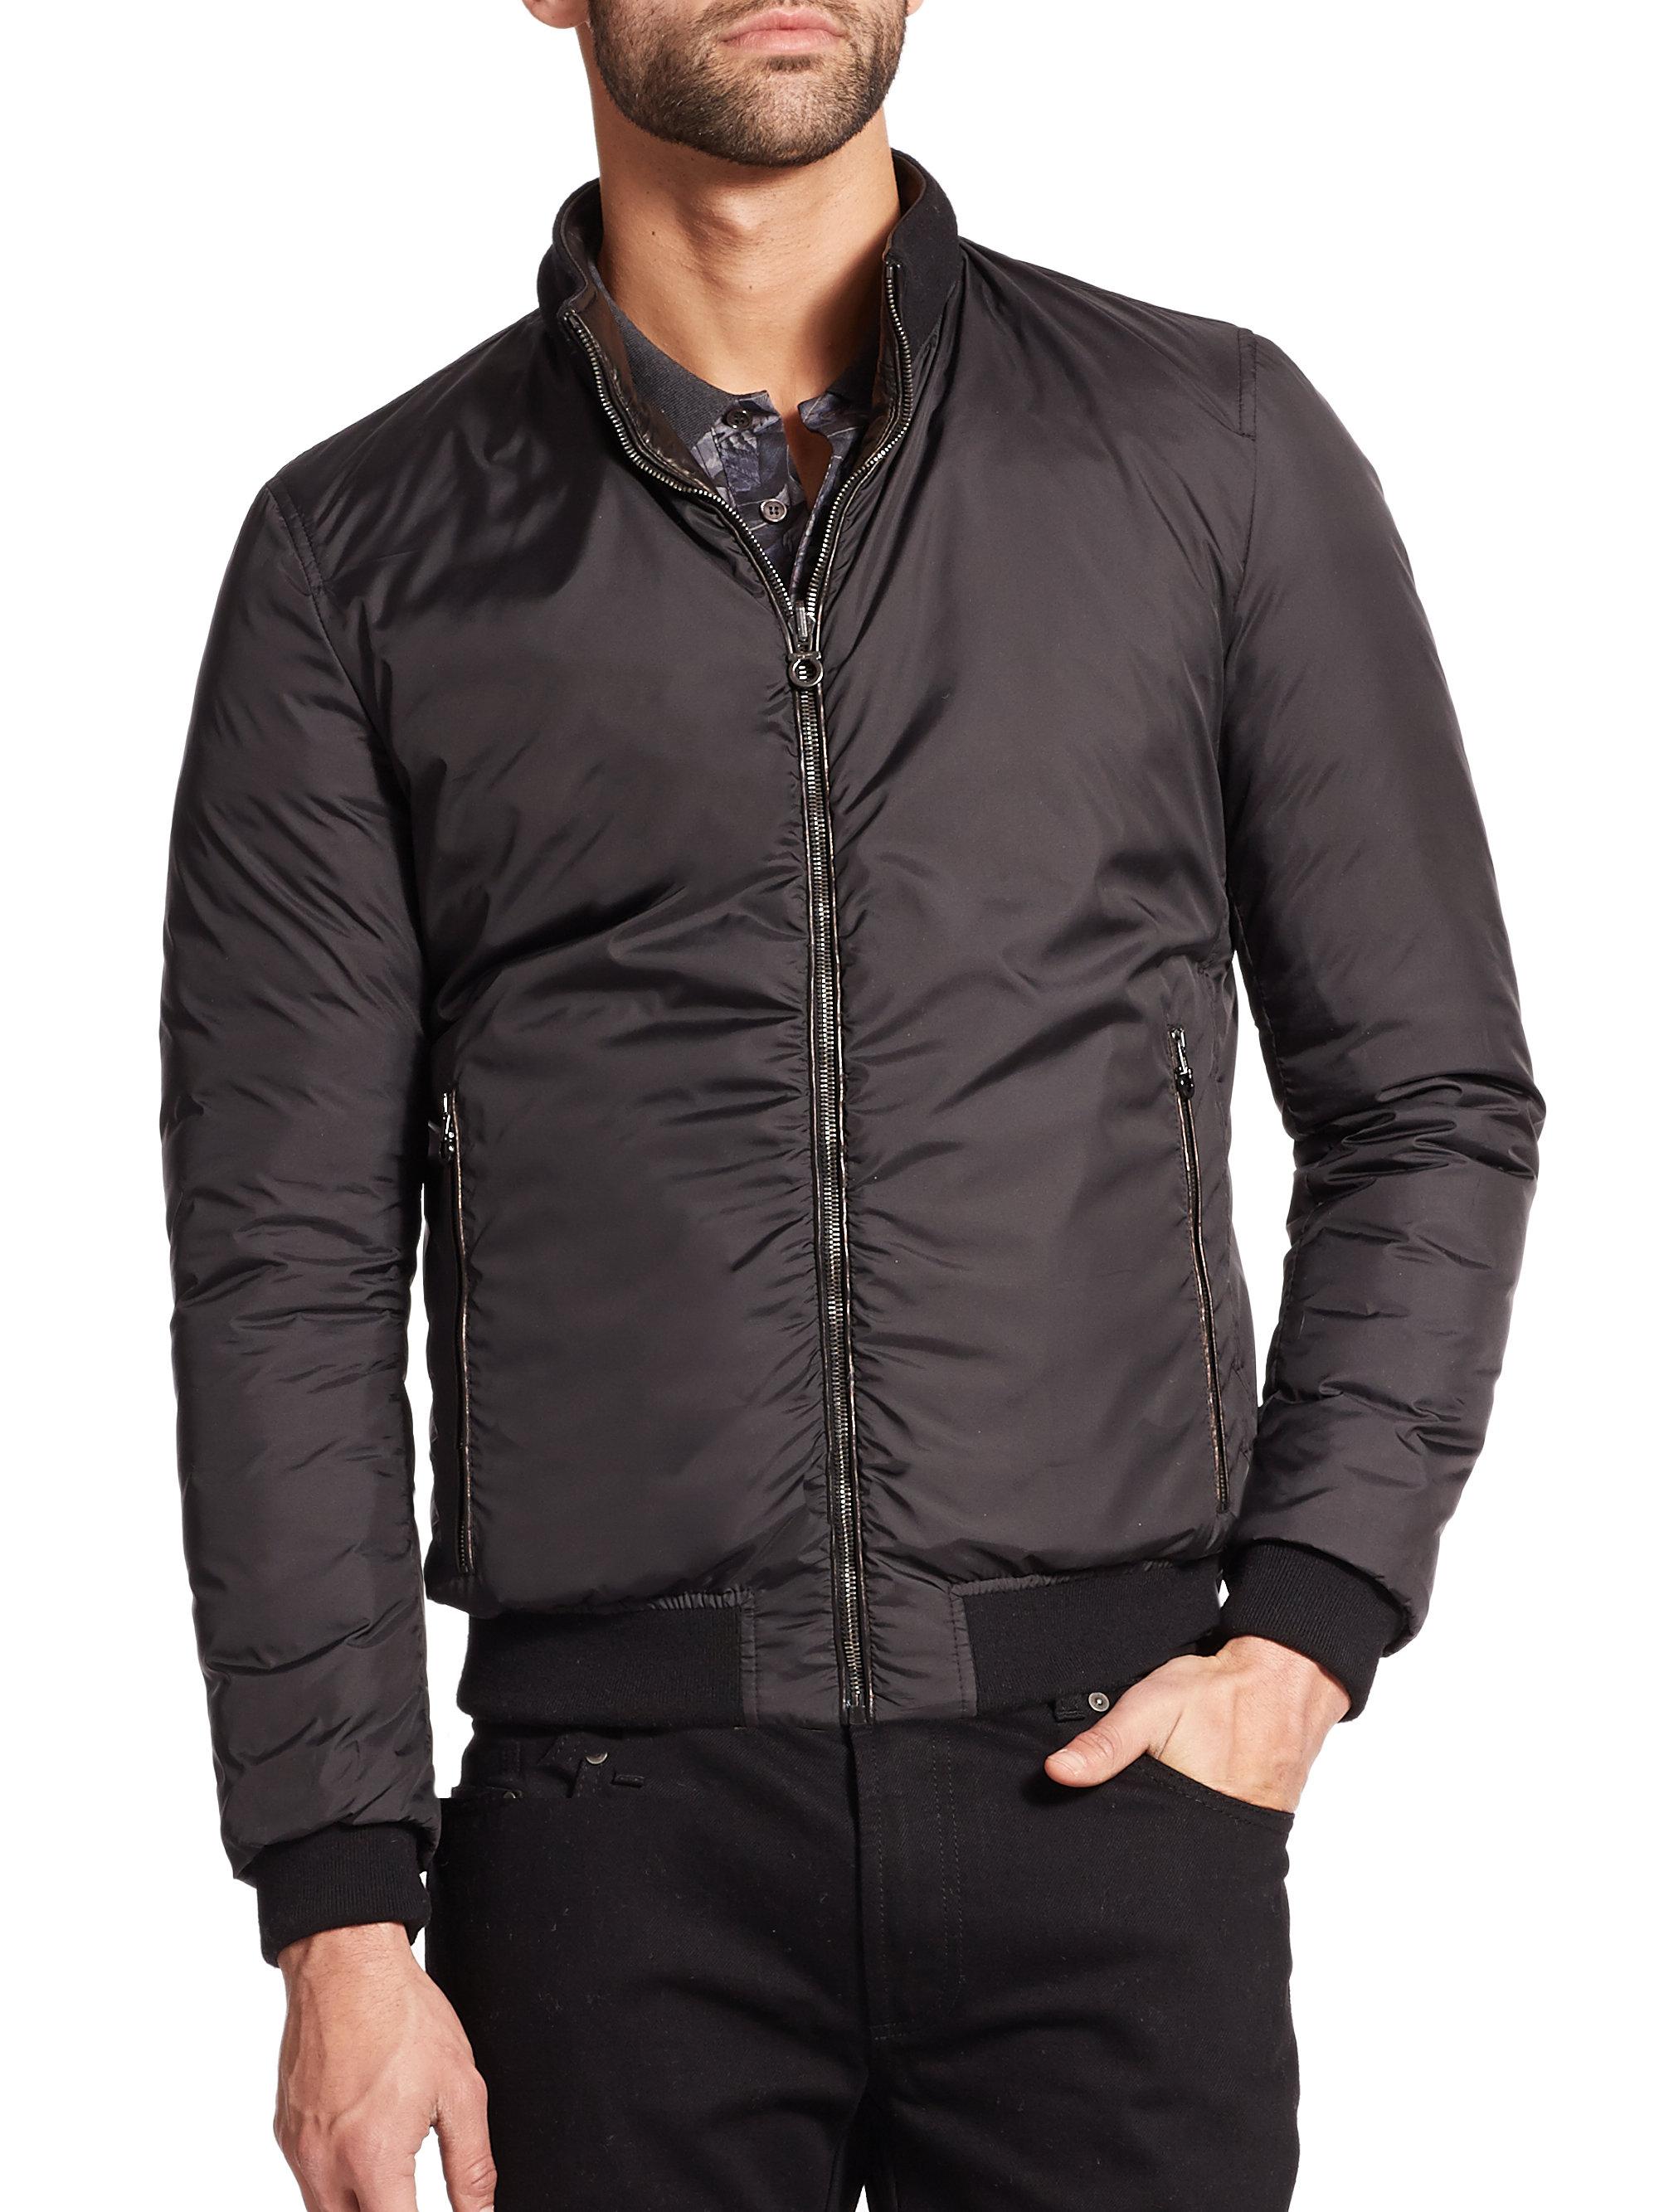 Ferragamo Reversible Leather Puffer Jacket in Black for ...